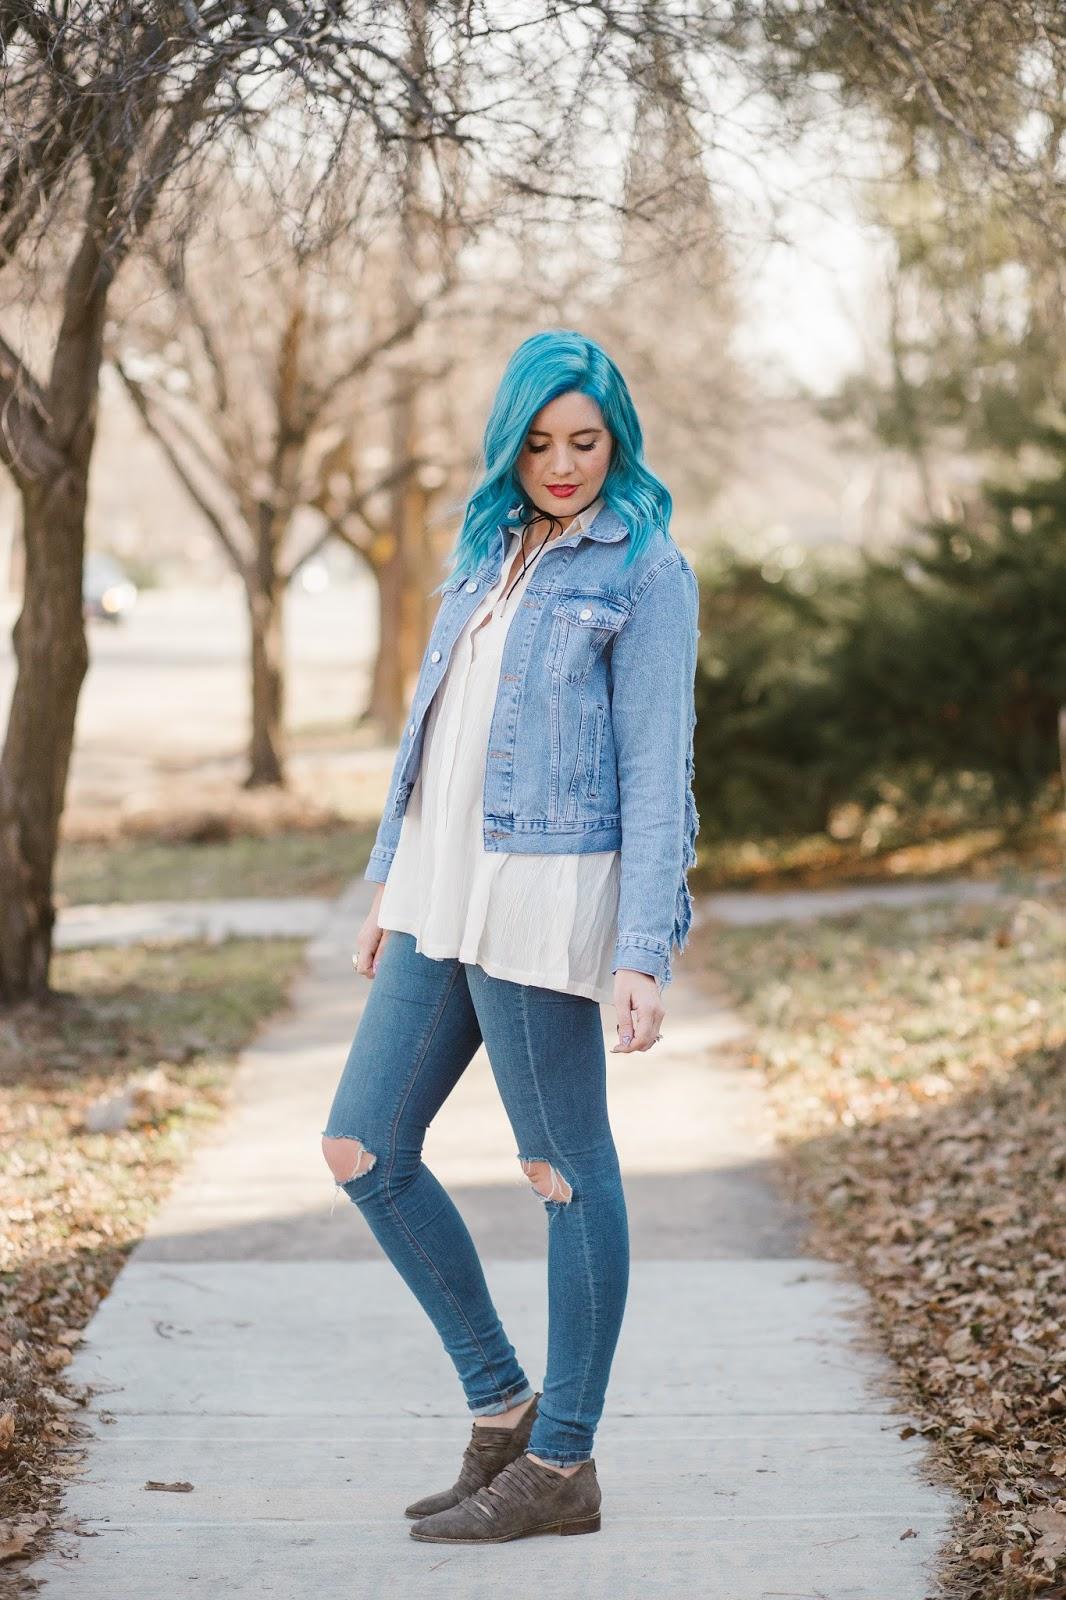 Blue Hair, Utah Fashion Blogger, Modest Outfit